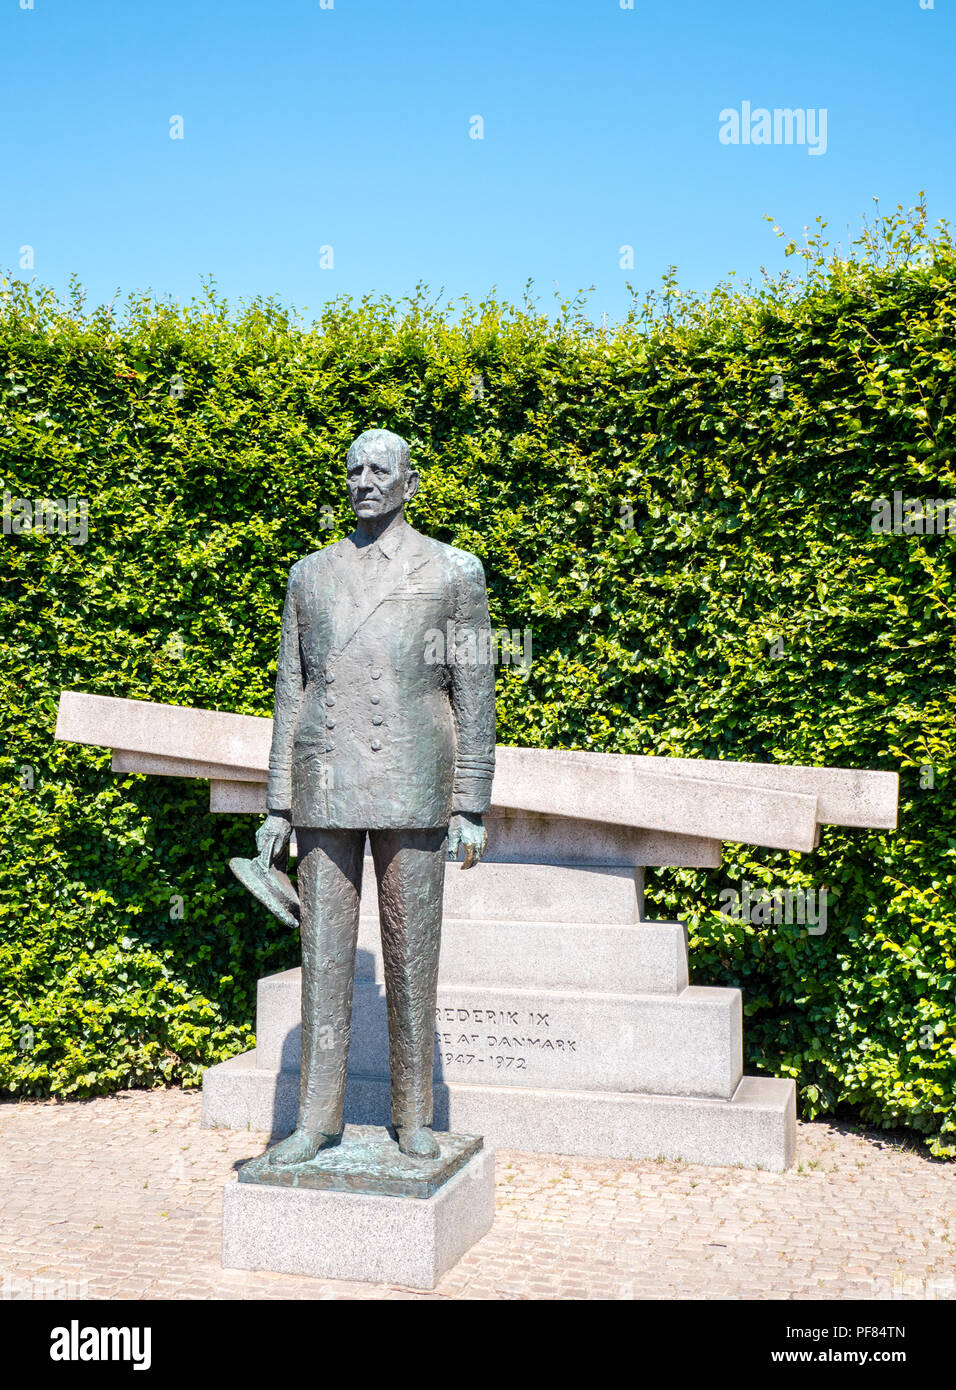 Danish King Frederik 9th Statue, Copenhagen, Zealand, Denmark, Europe. - Stock Image